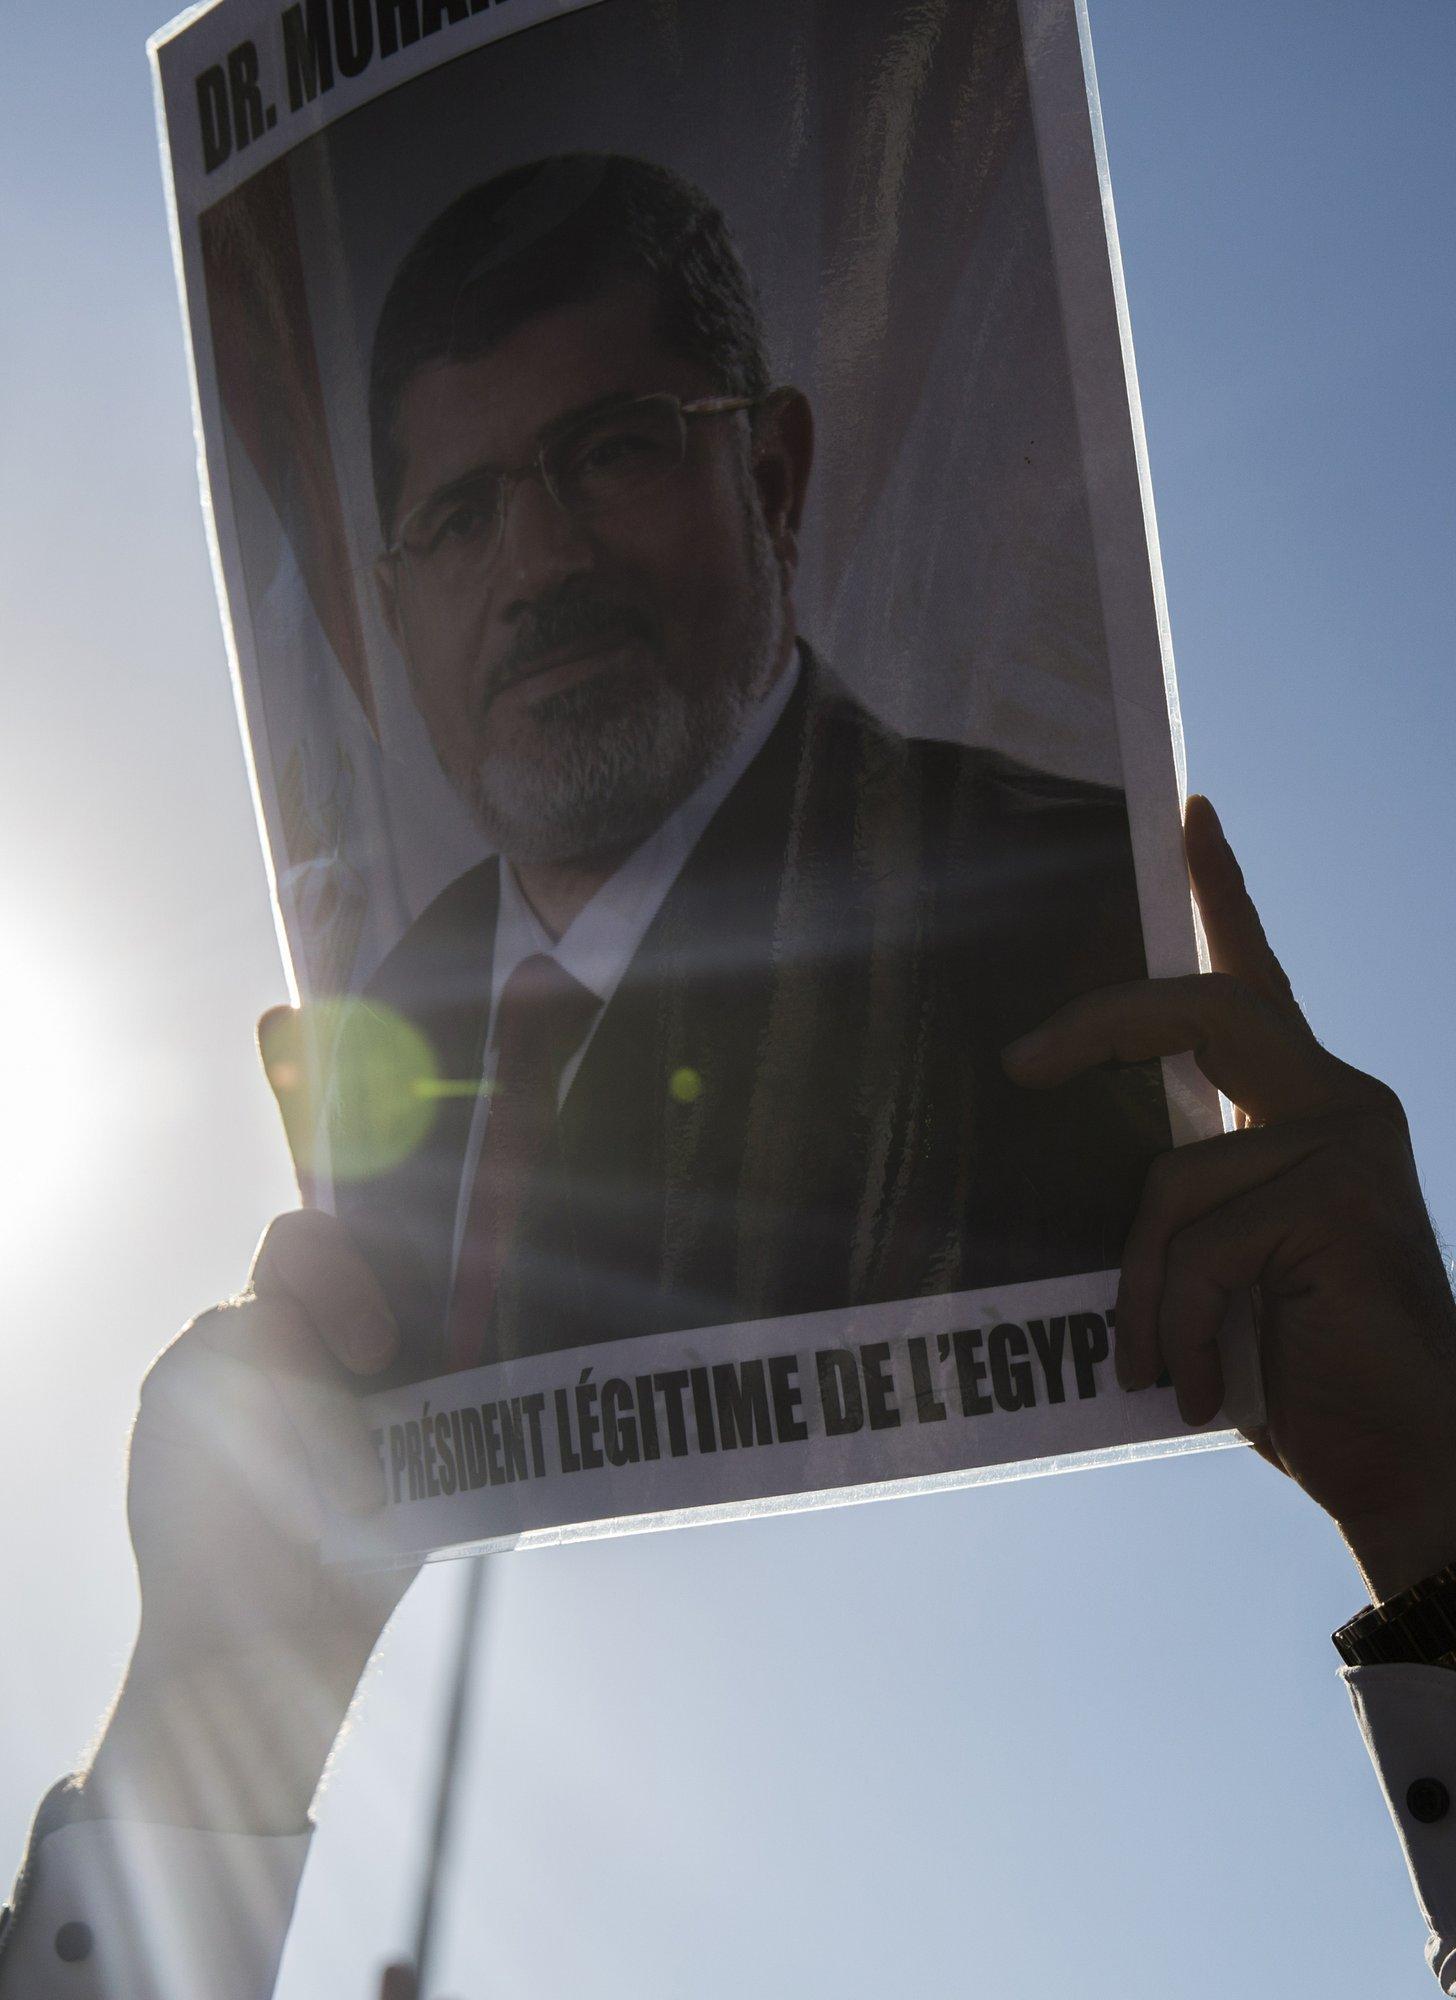 Al-Qaida accuses Egypt of killing ex-president Morsi in jail